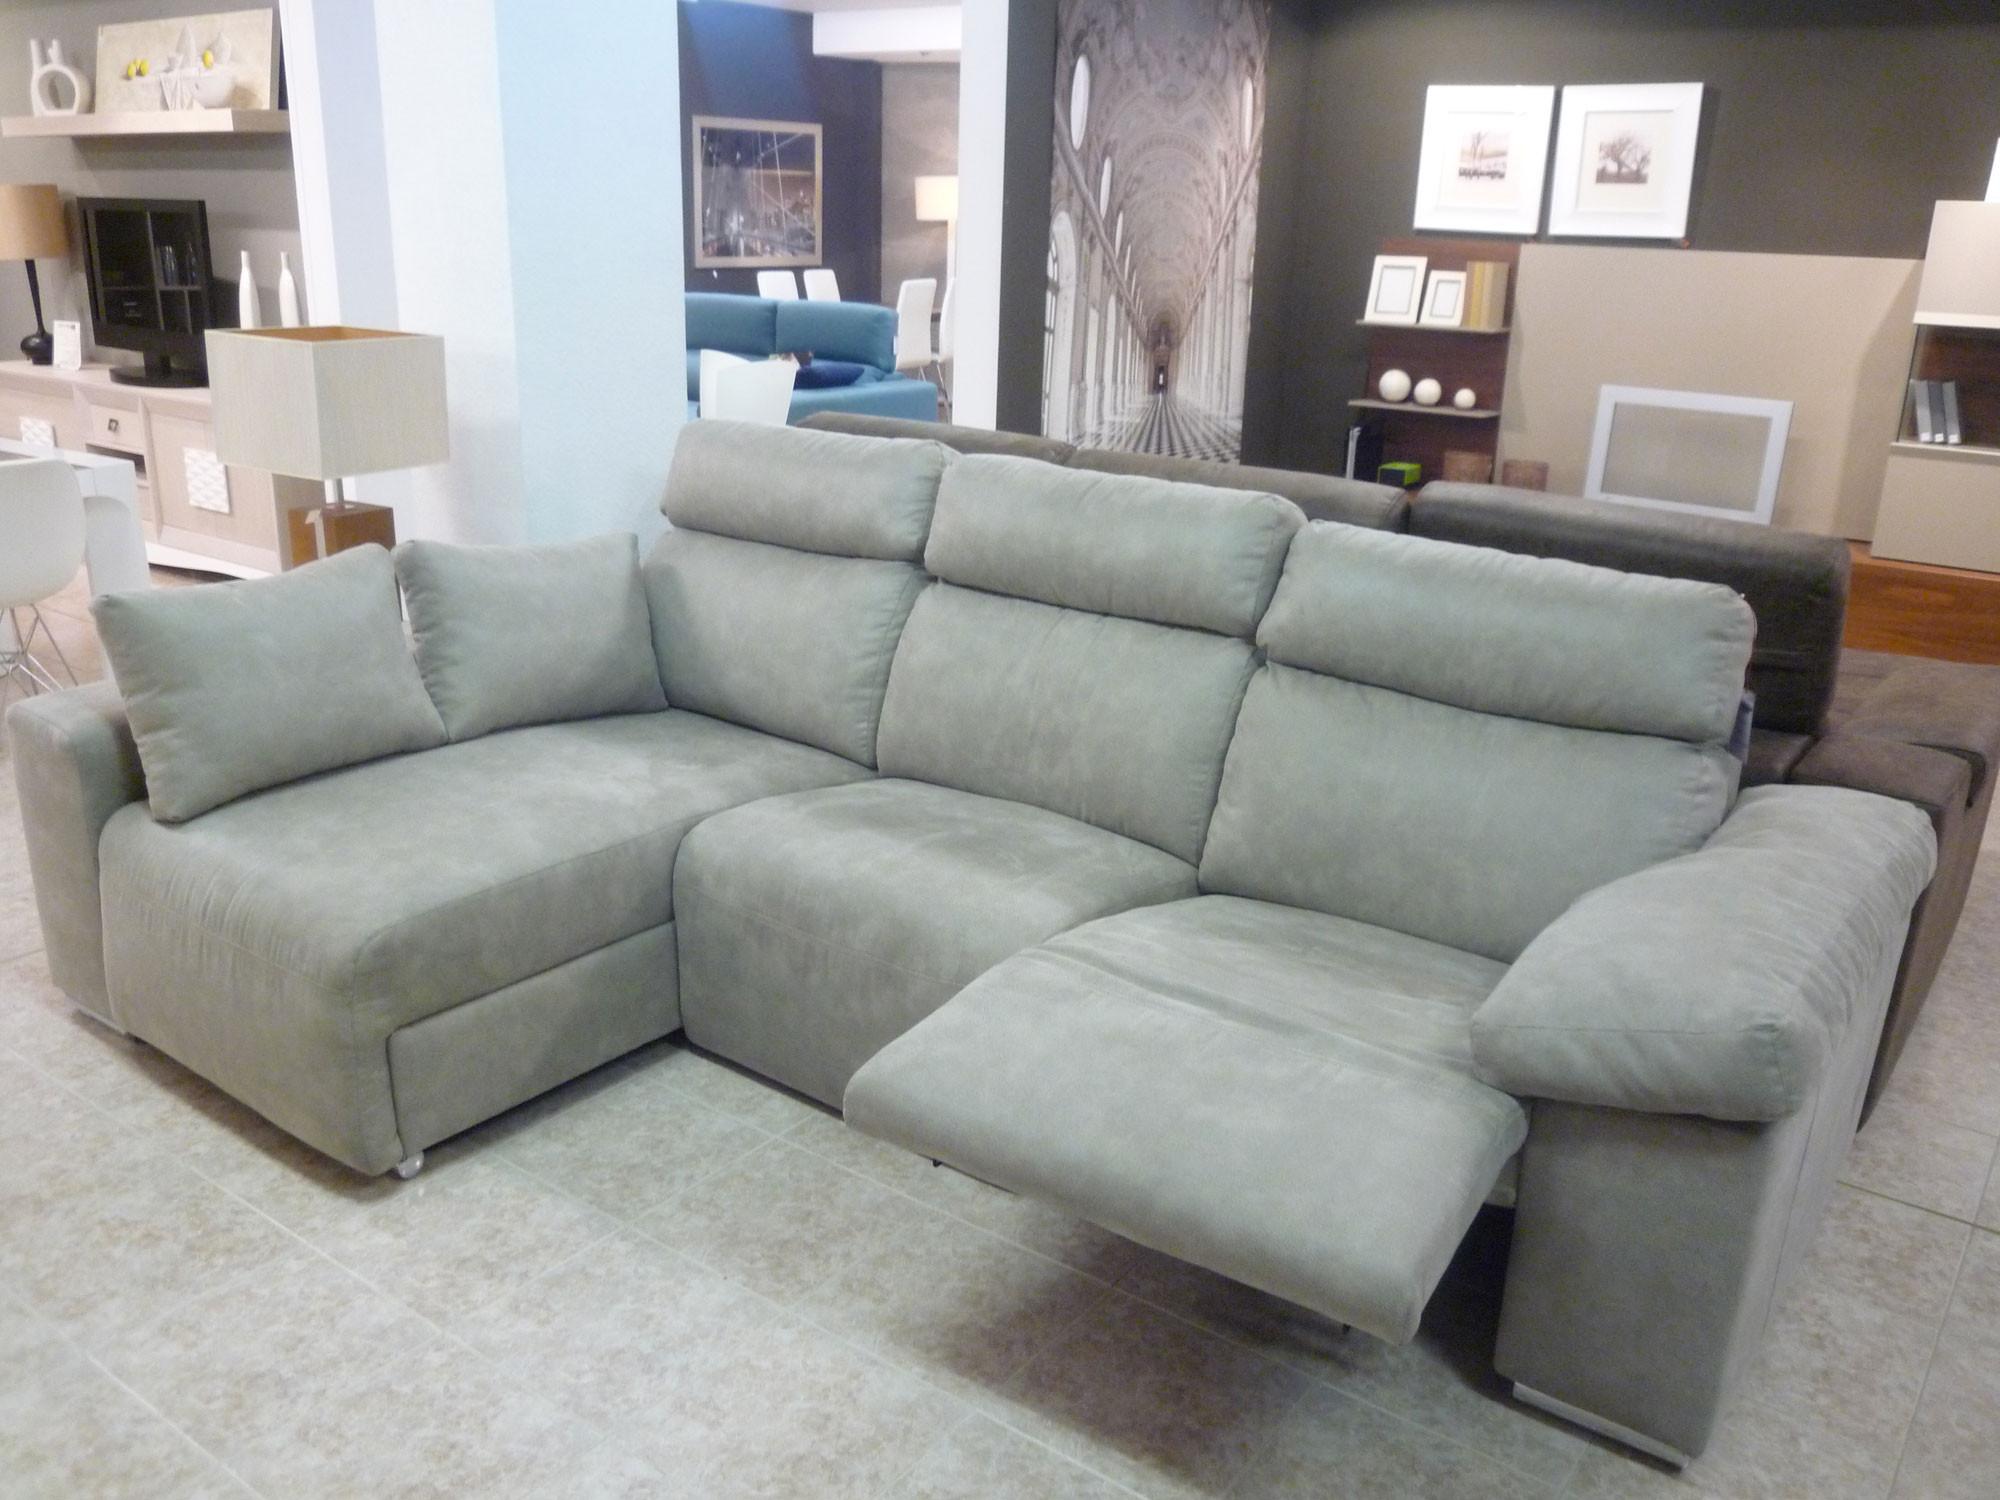 Sofa Cama De Diseño Thdr Tienda Muebles Diseà O sofa Cama DiseO DiseO A Sala Cuartoz